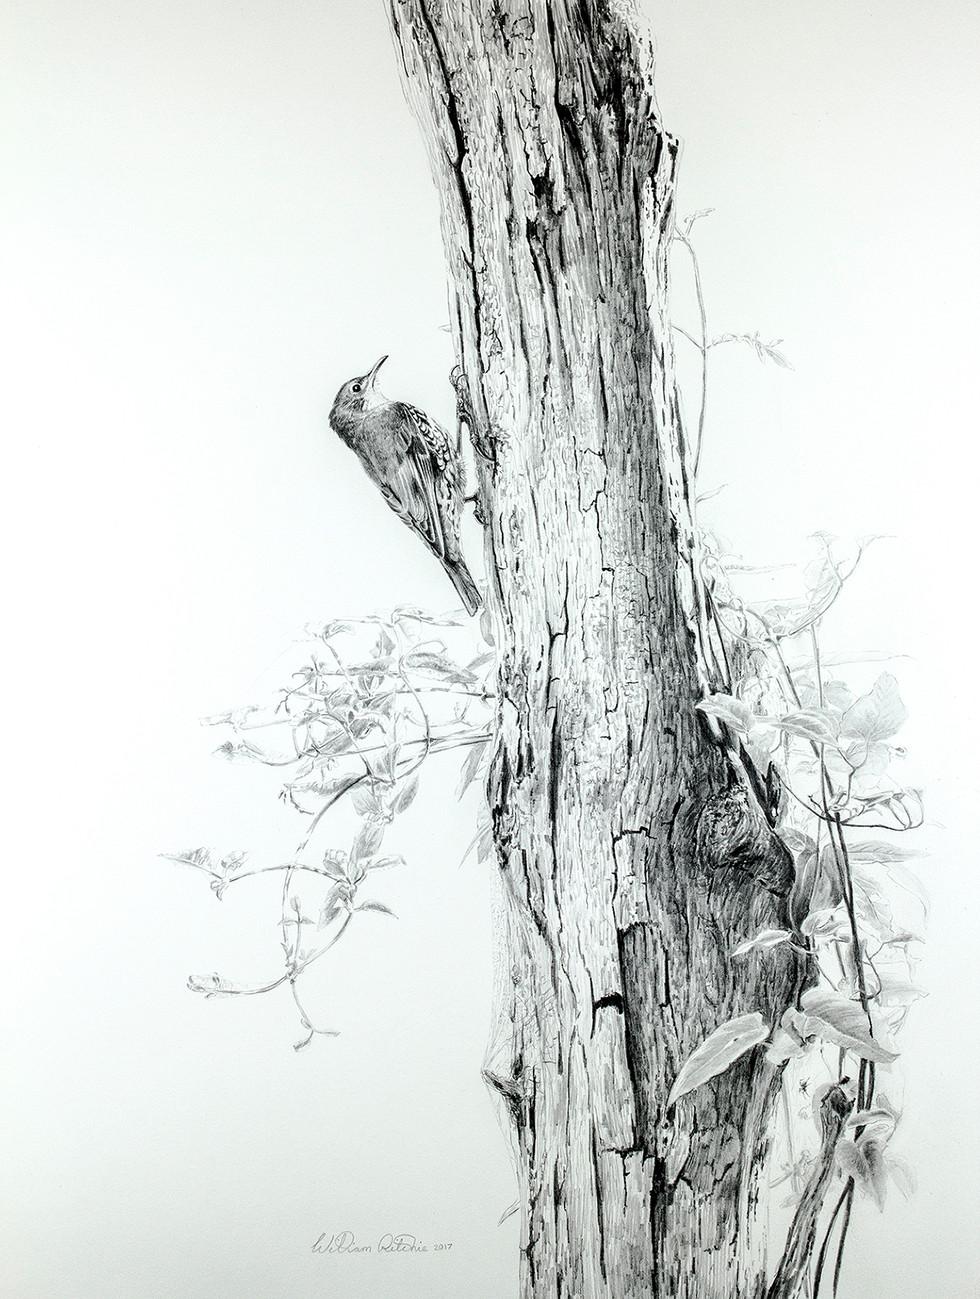 Treecreepers